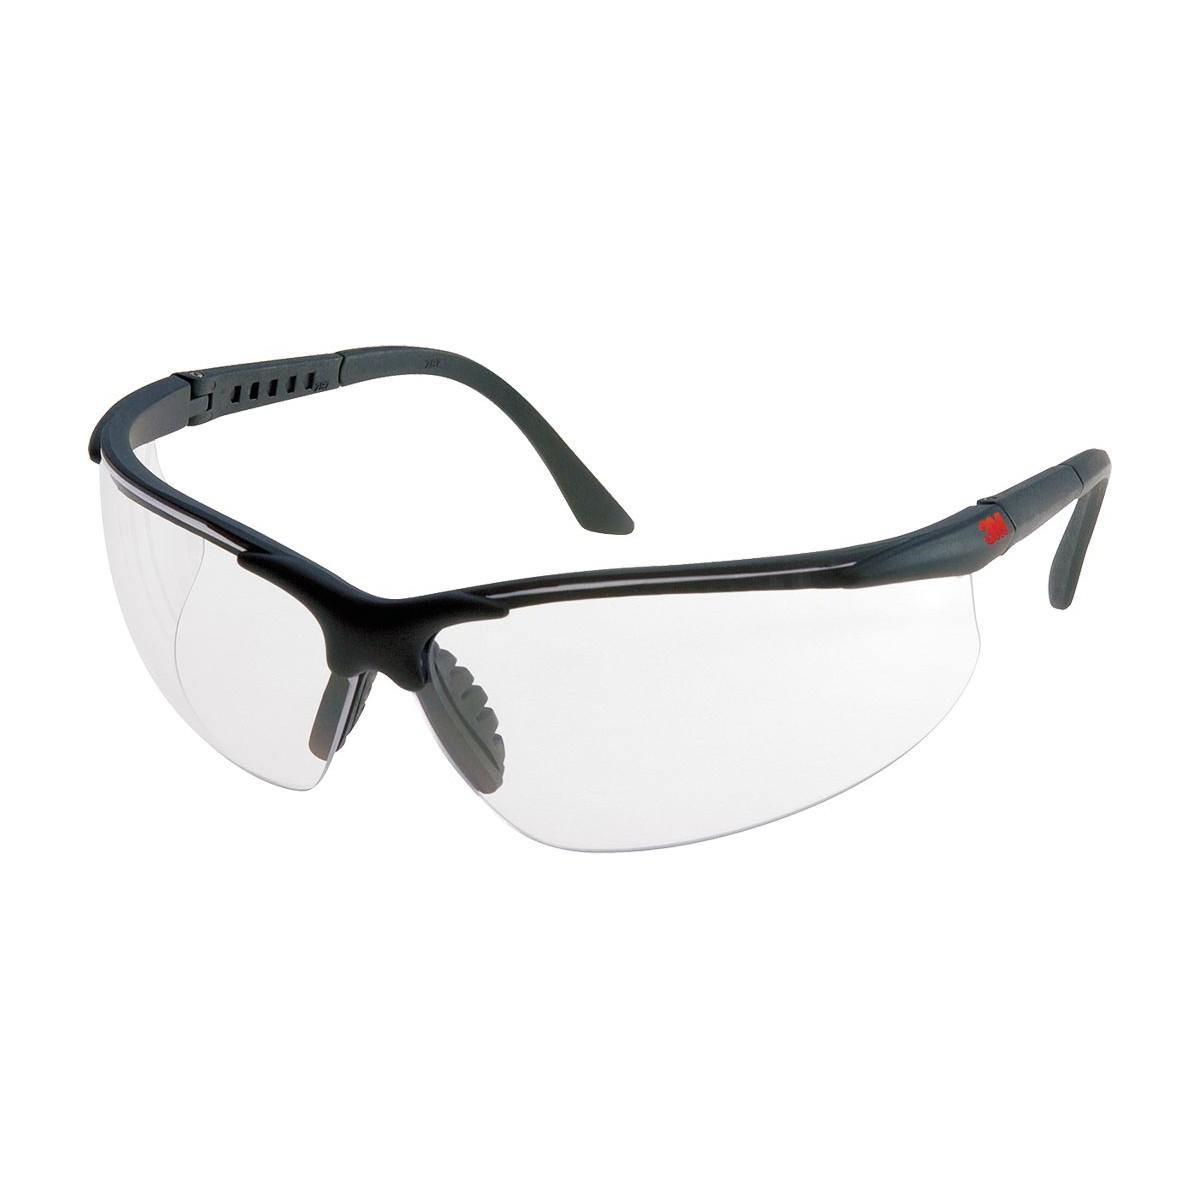 b6d9d6c46318d8 Okulary ochronne 3M-OO-2750 T transparentne